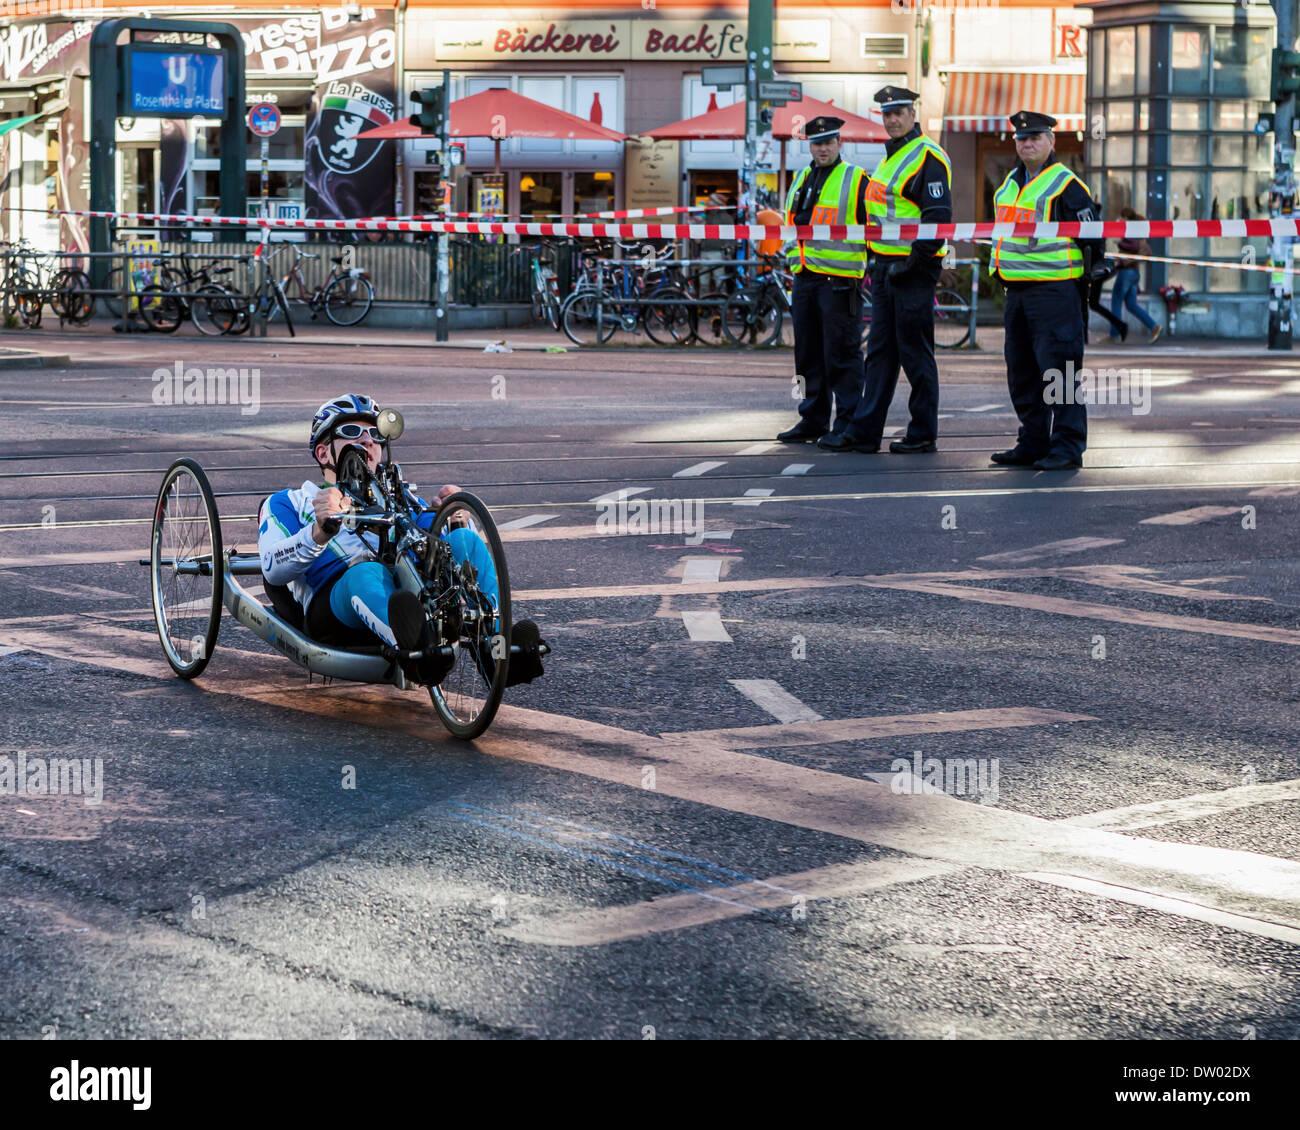 Disabled handbike competitor in 40th 42 kilometre Berlin marathon 2013 - Rosenthalerplatz, Mitte, Berlin - Stock Image